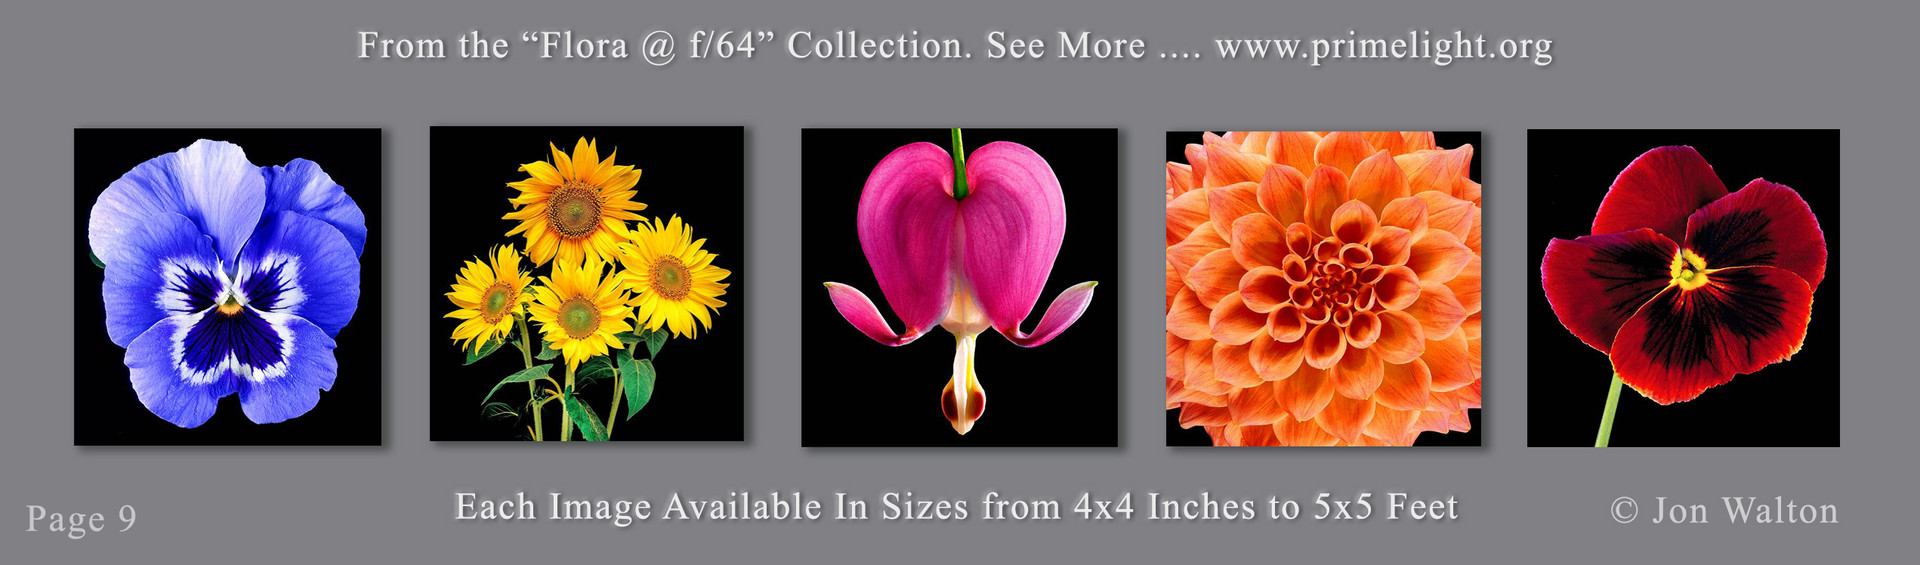 9 Flora.jpg